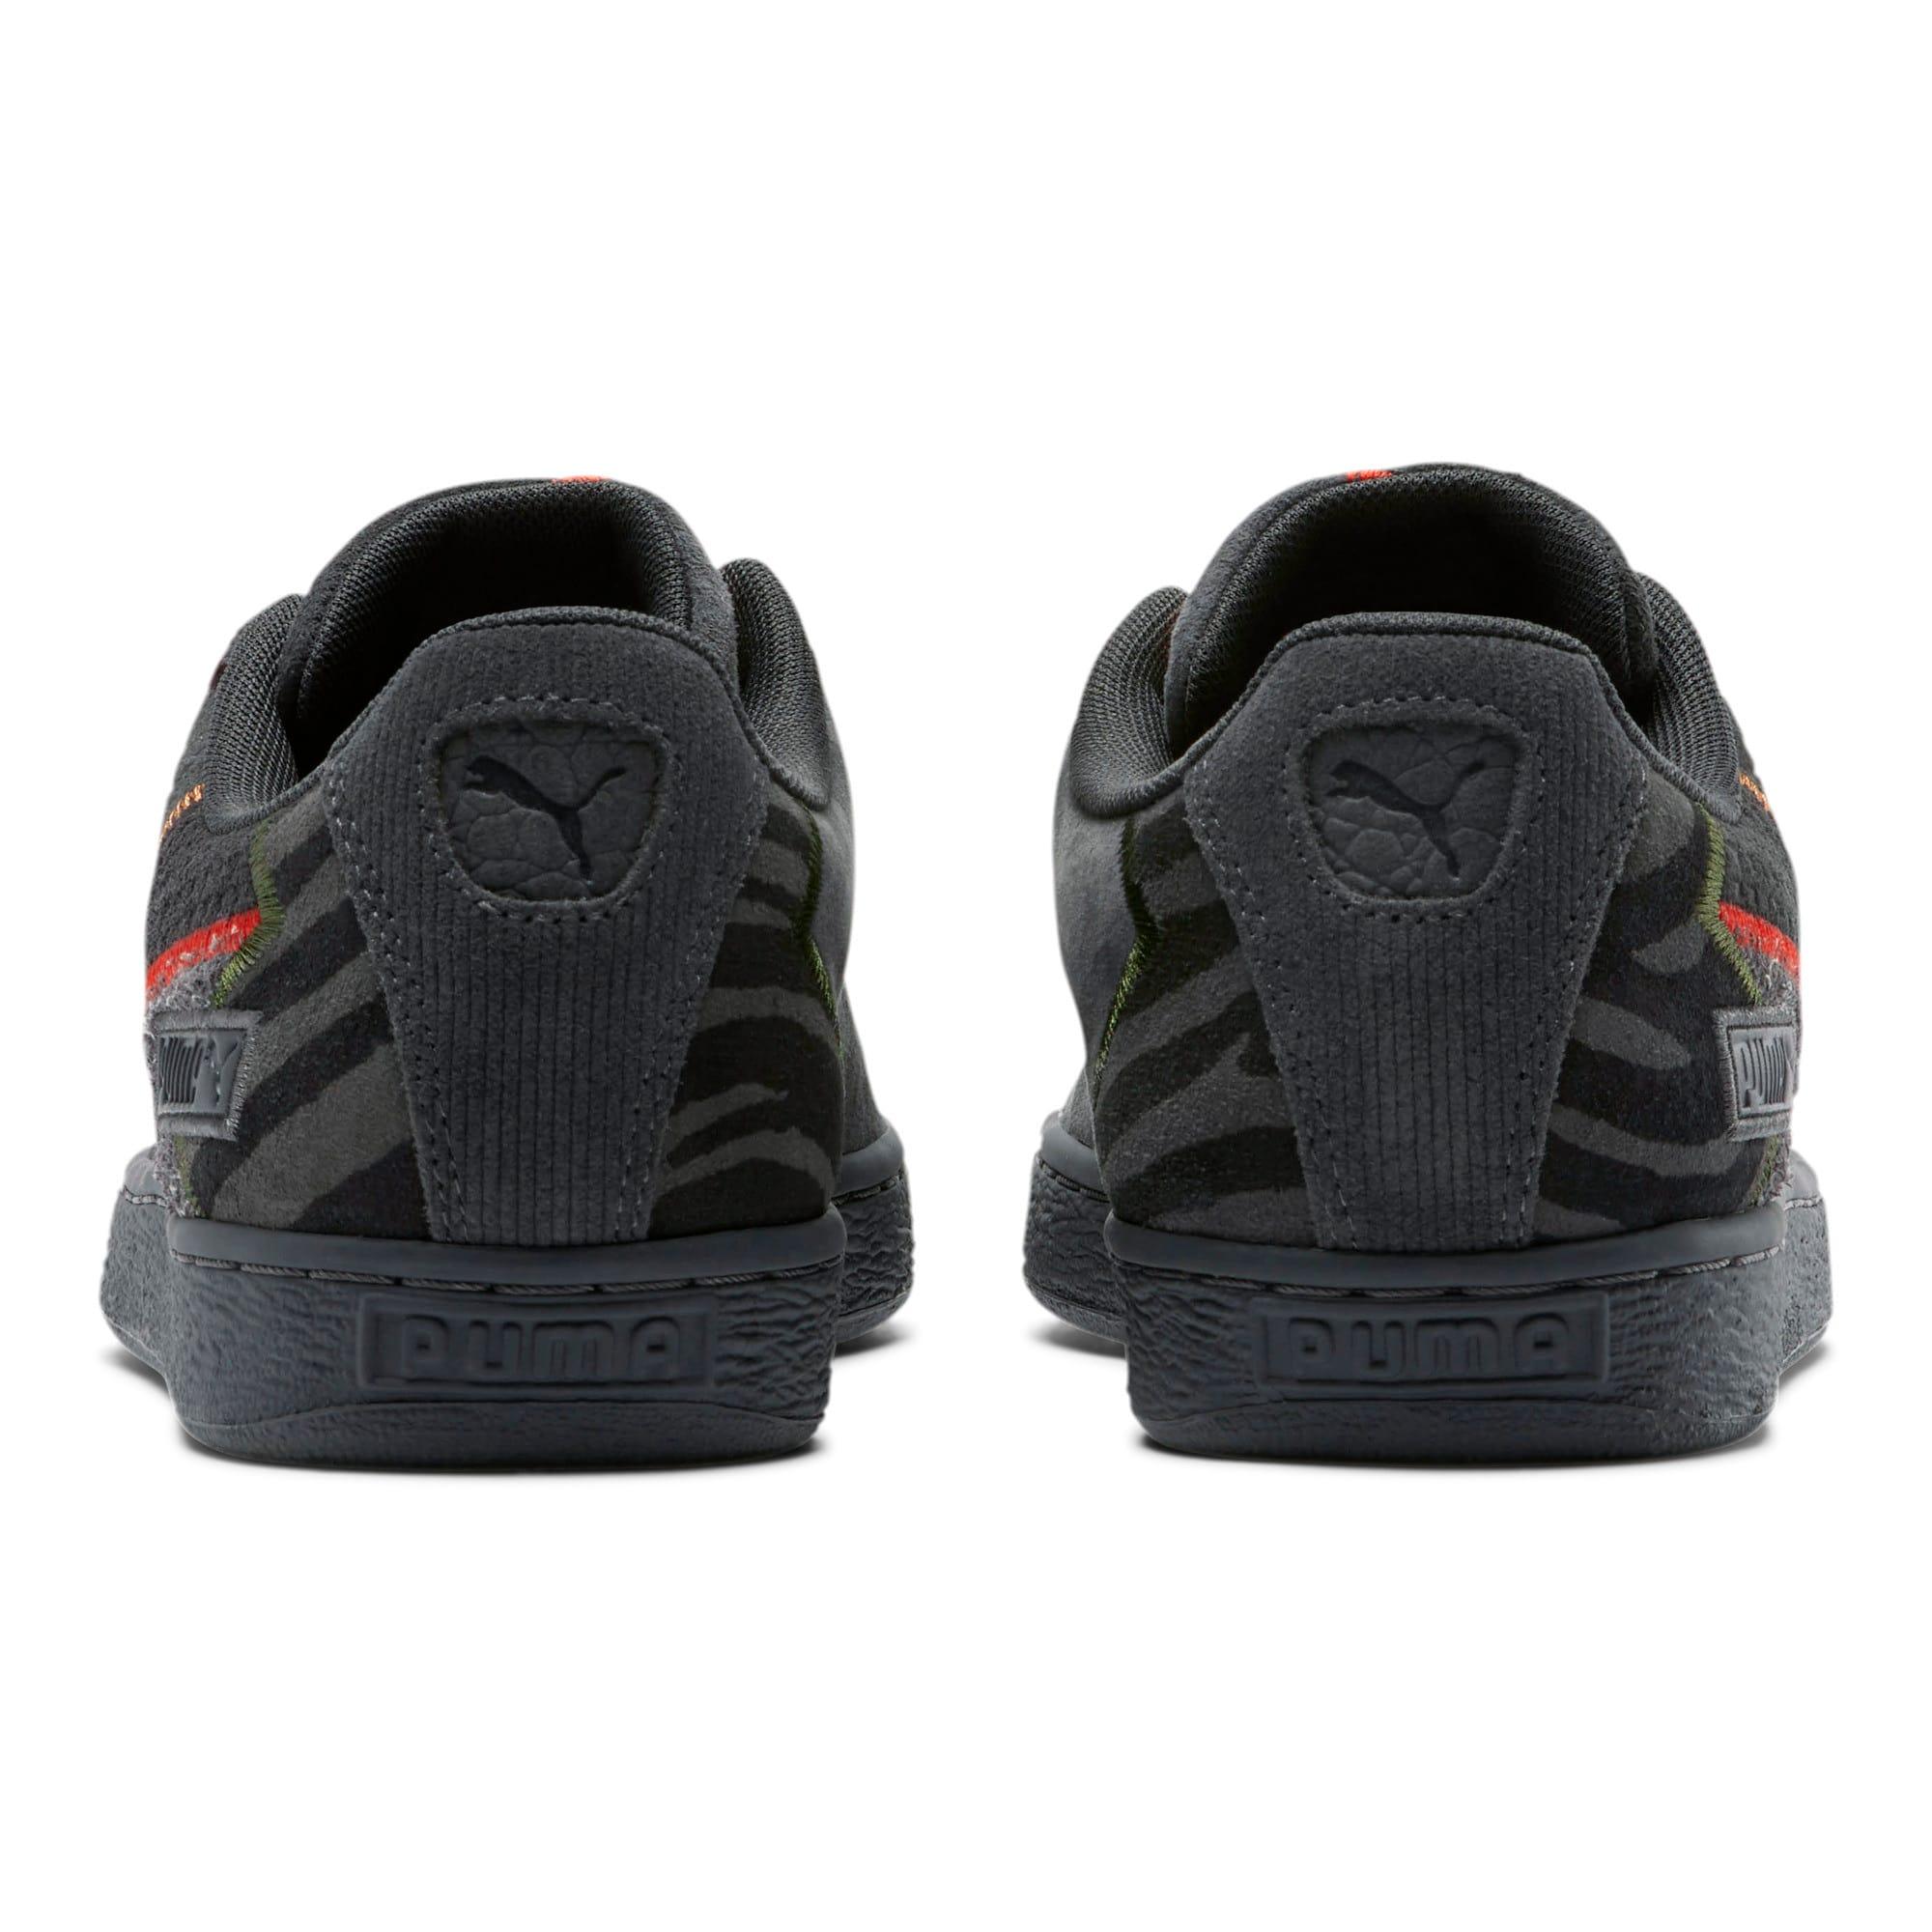 Thumbnail 3 of Suede RP Fashion Geek Sneakers, Asphalt, medium